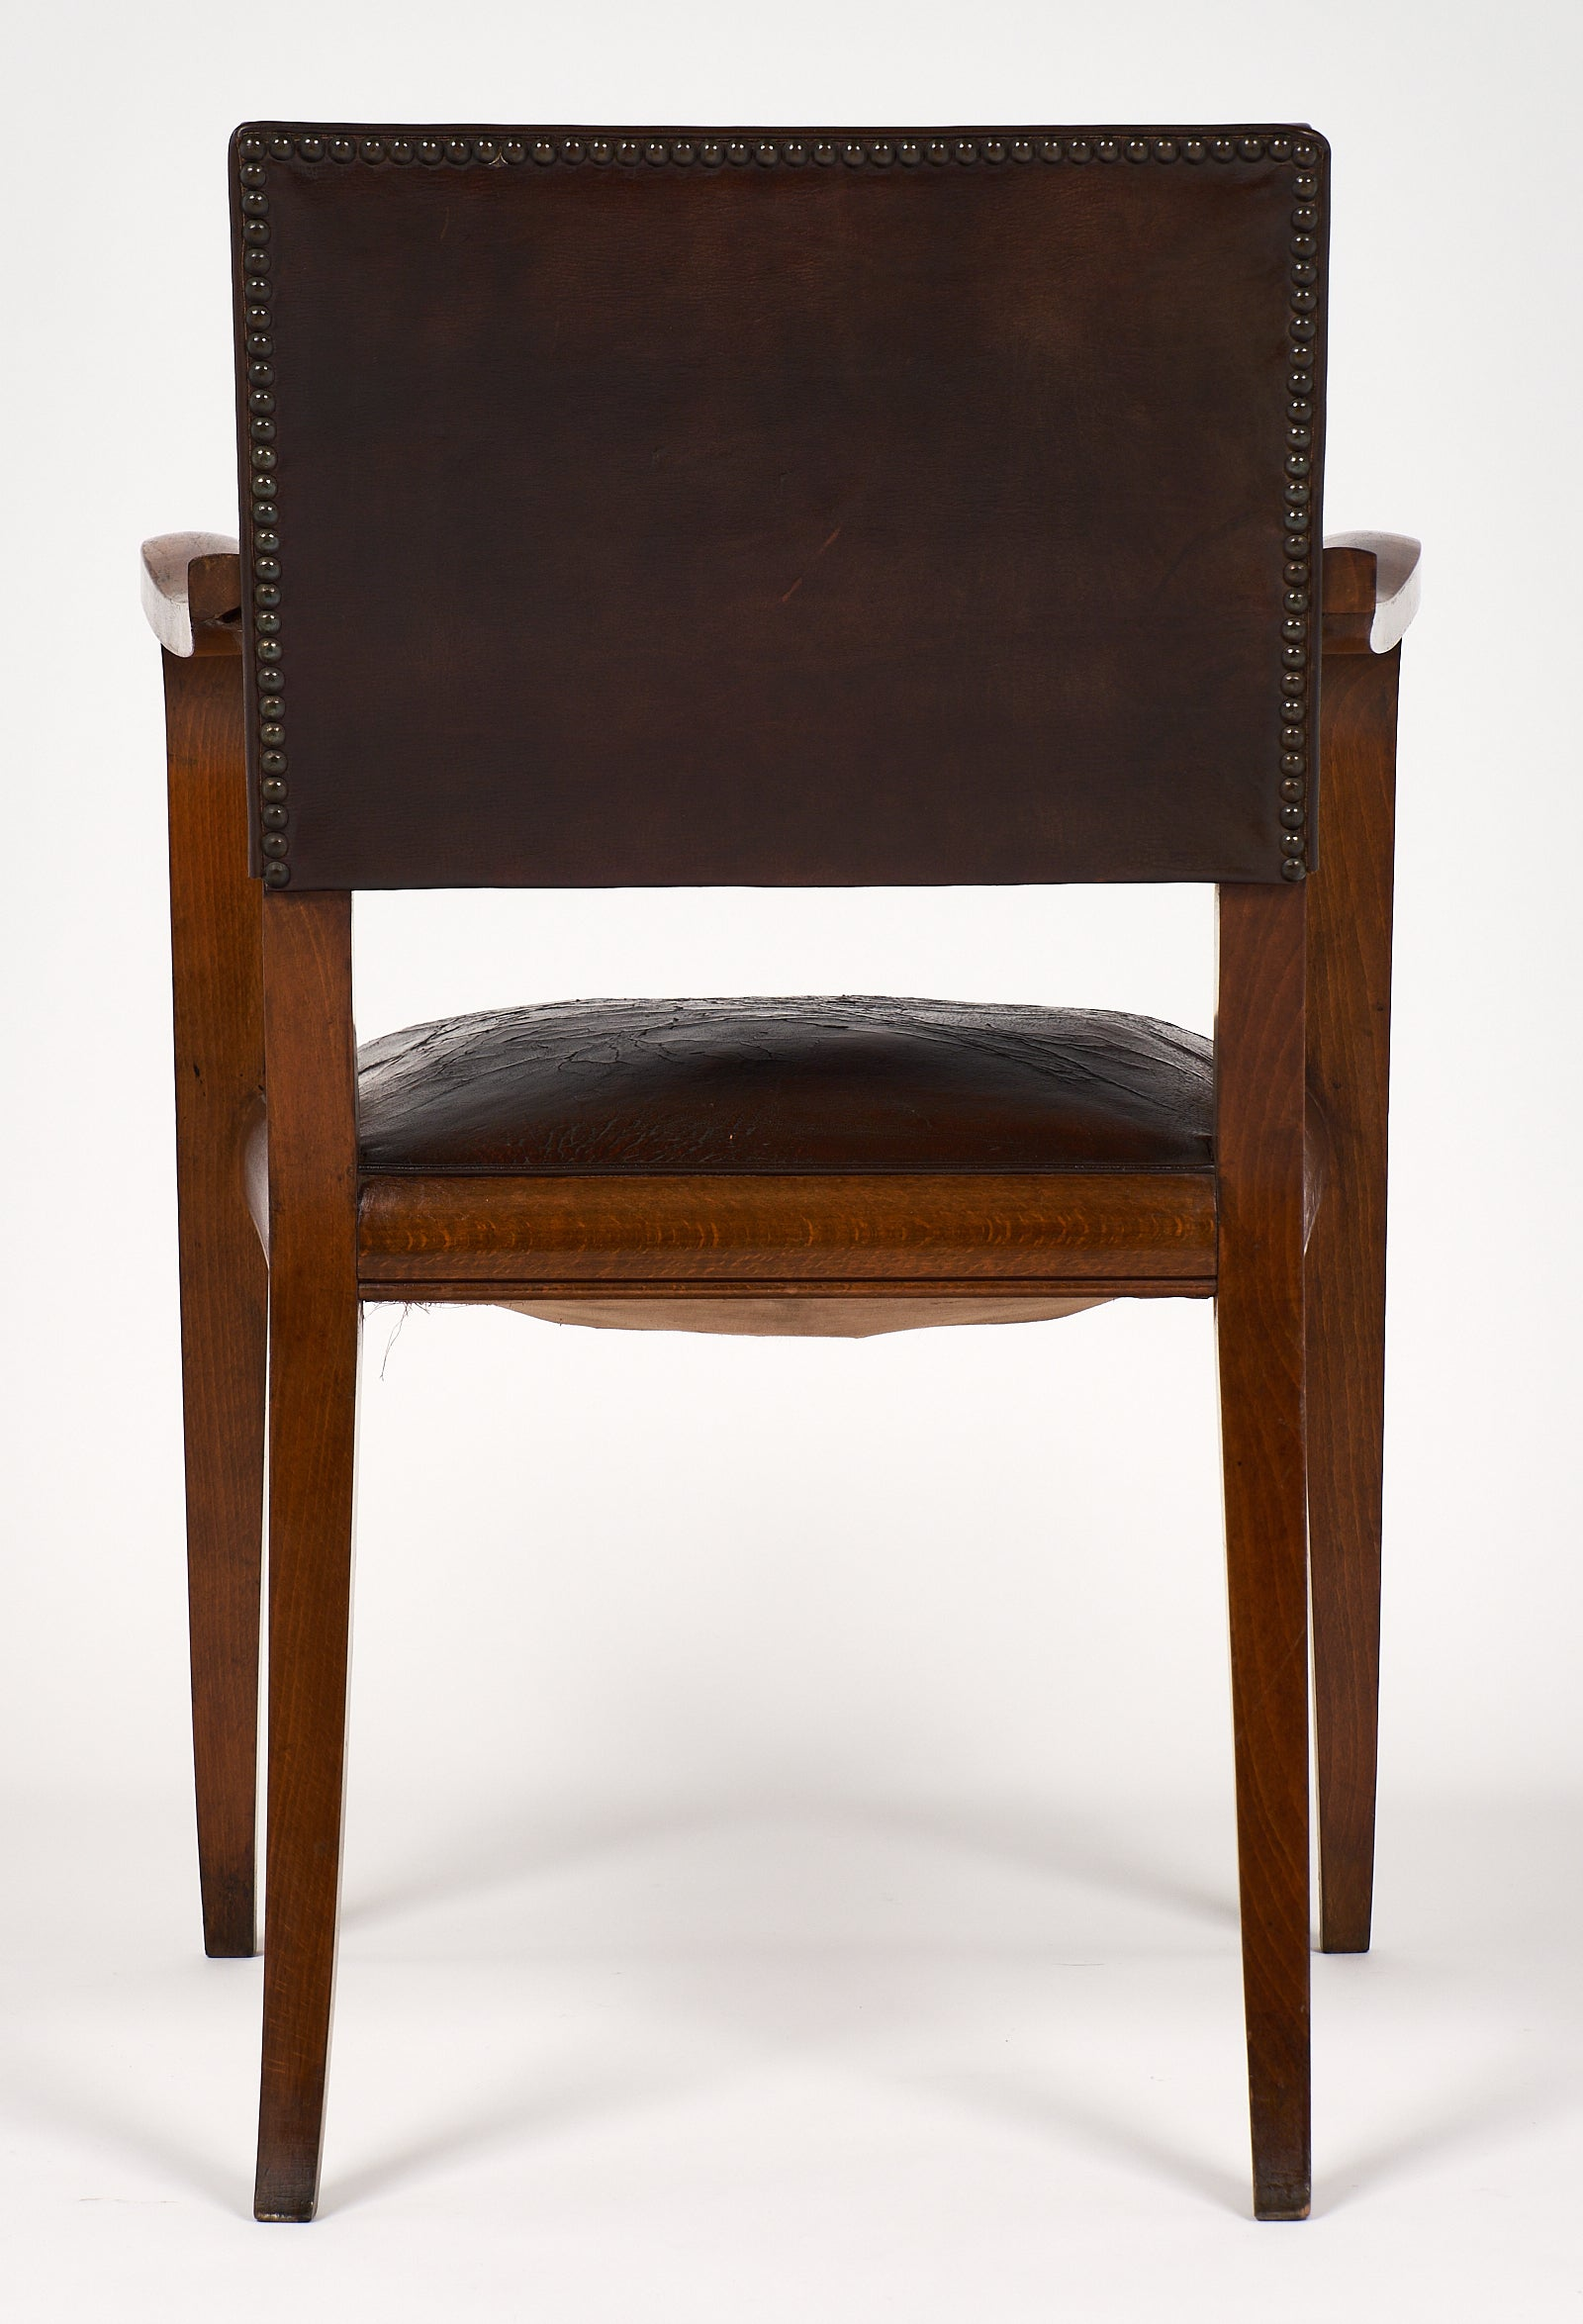 Art deco period furniture Original Jeanluc Ferrand Antiquaire Art Deco Period French Bridge Chair For Sale At 1stdibs